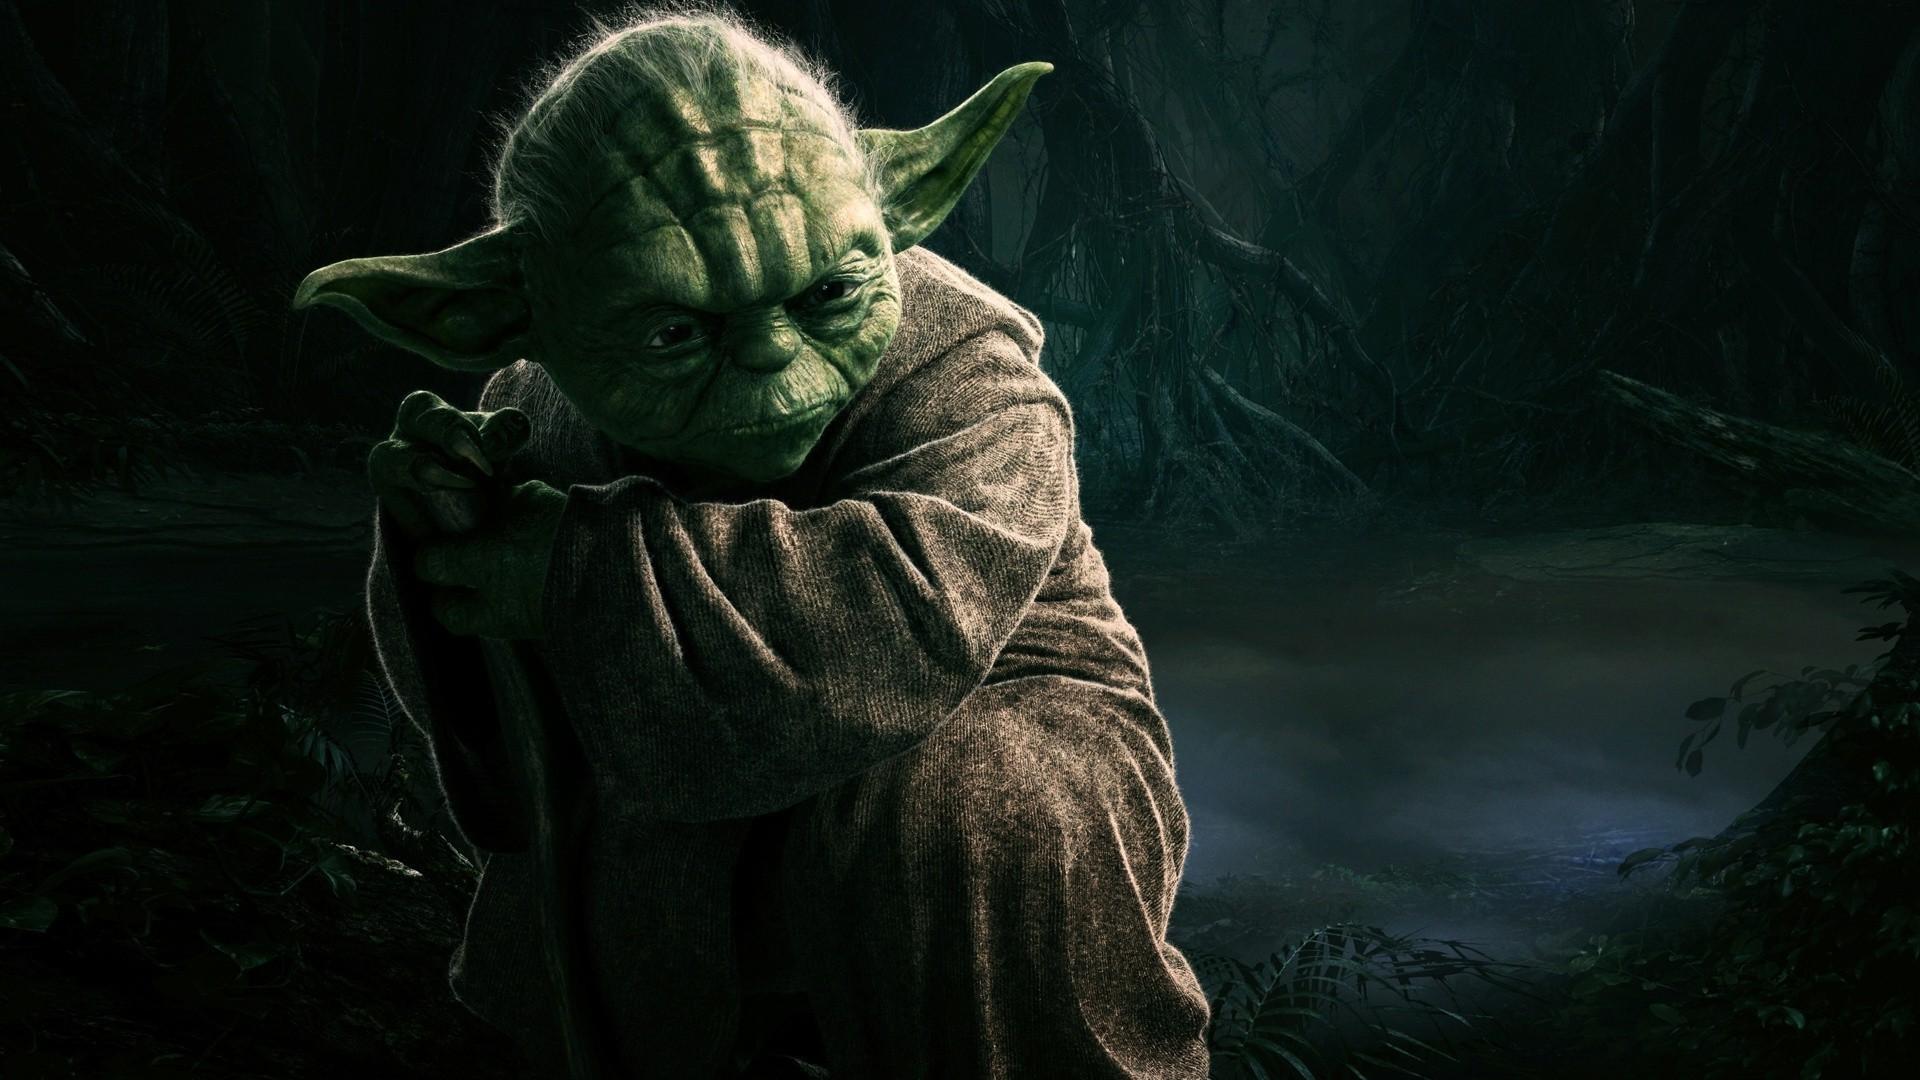 Star Wars Desktop Wallpaper (69+ Images